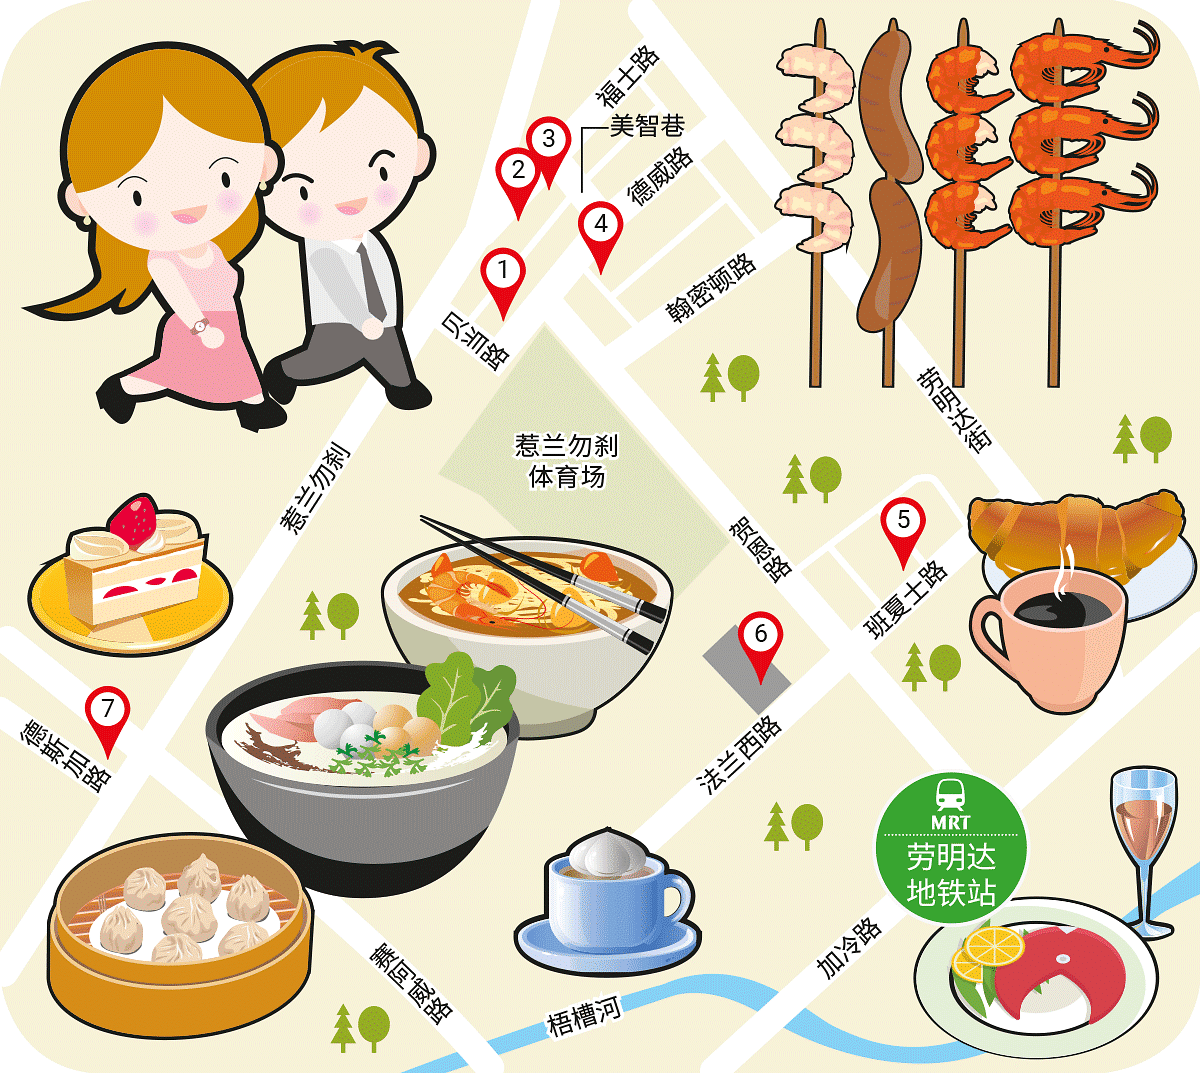 Wanbao Food Search @Jalan Besar & Lavender MRT Stations